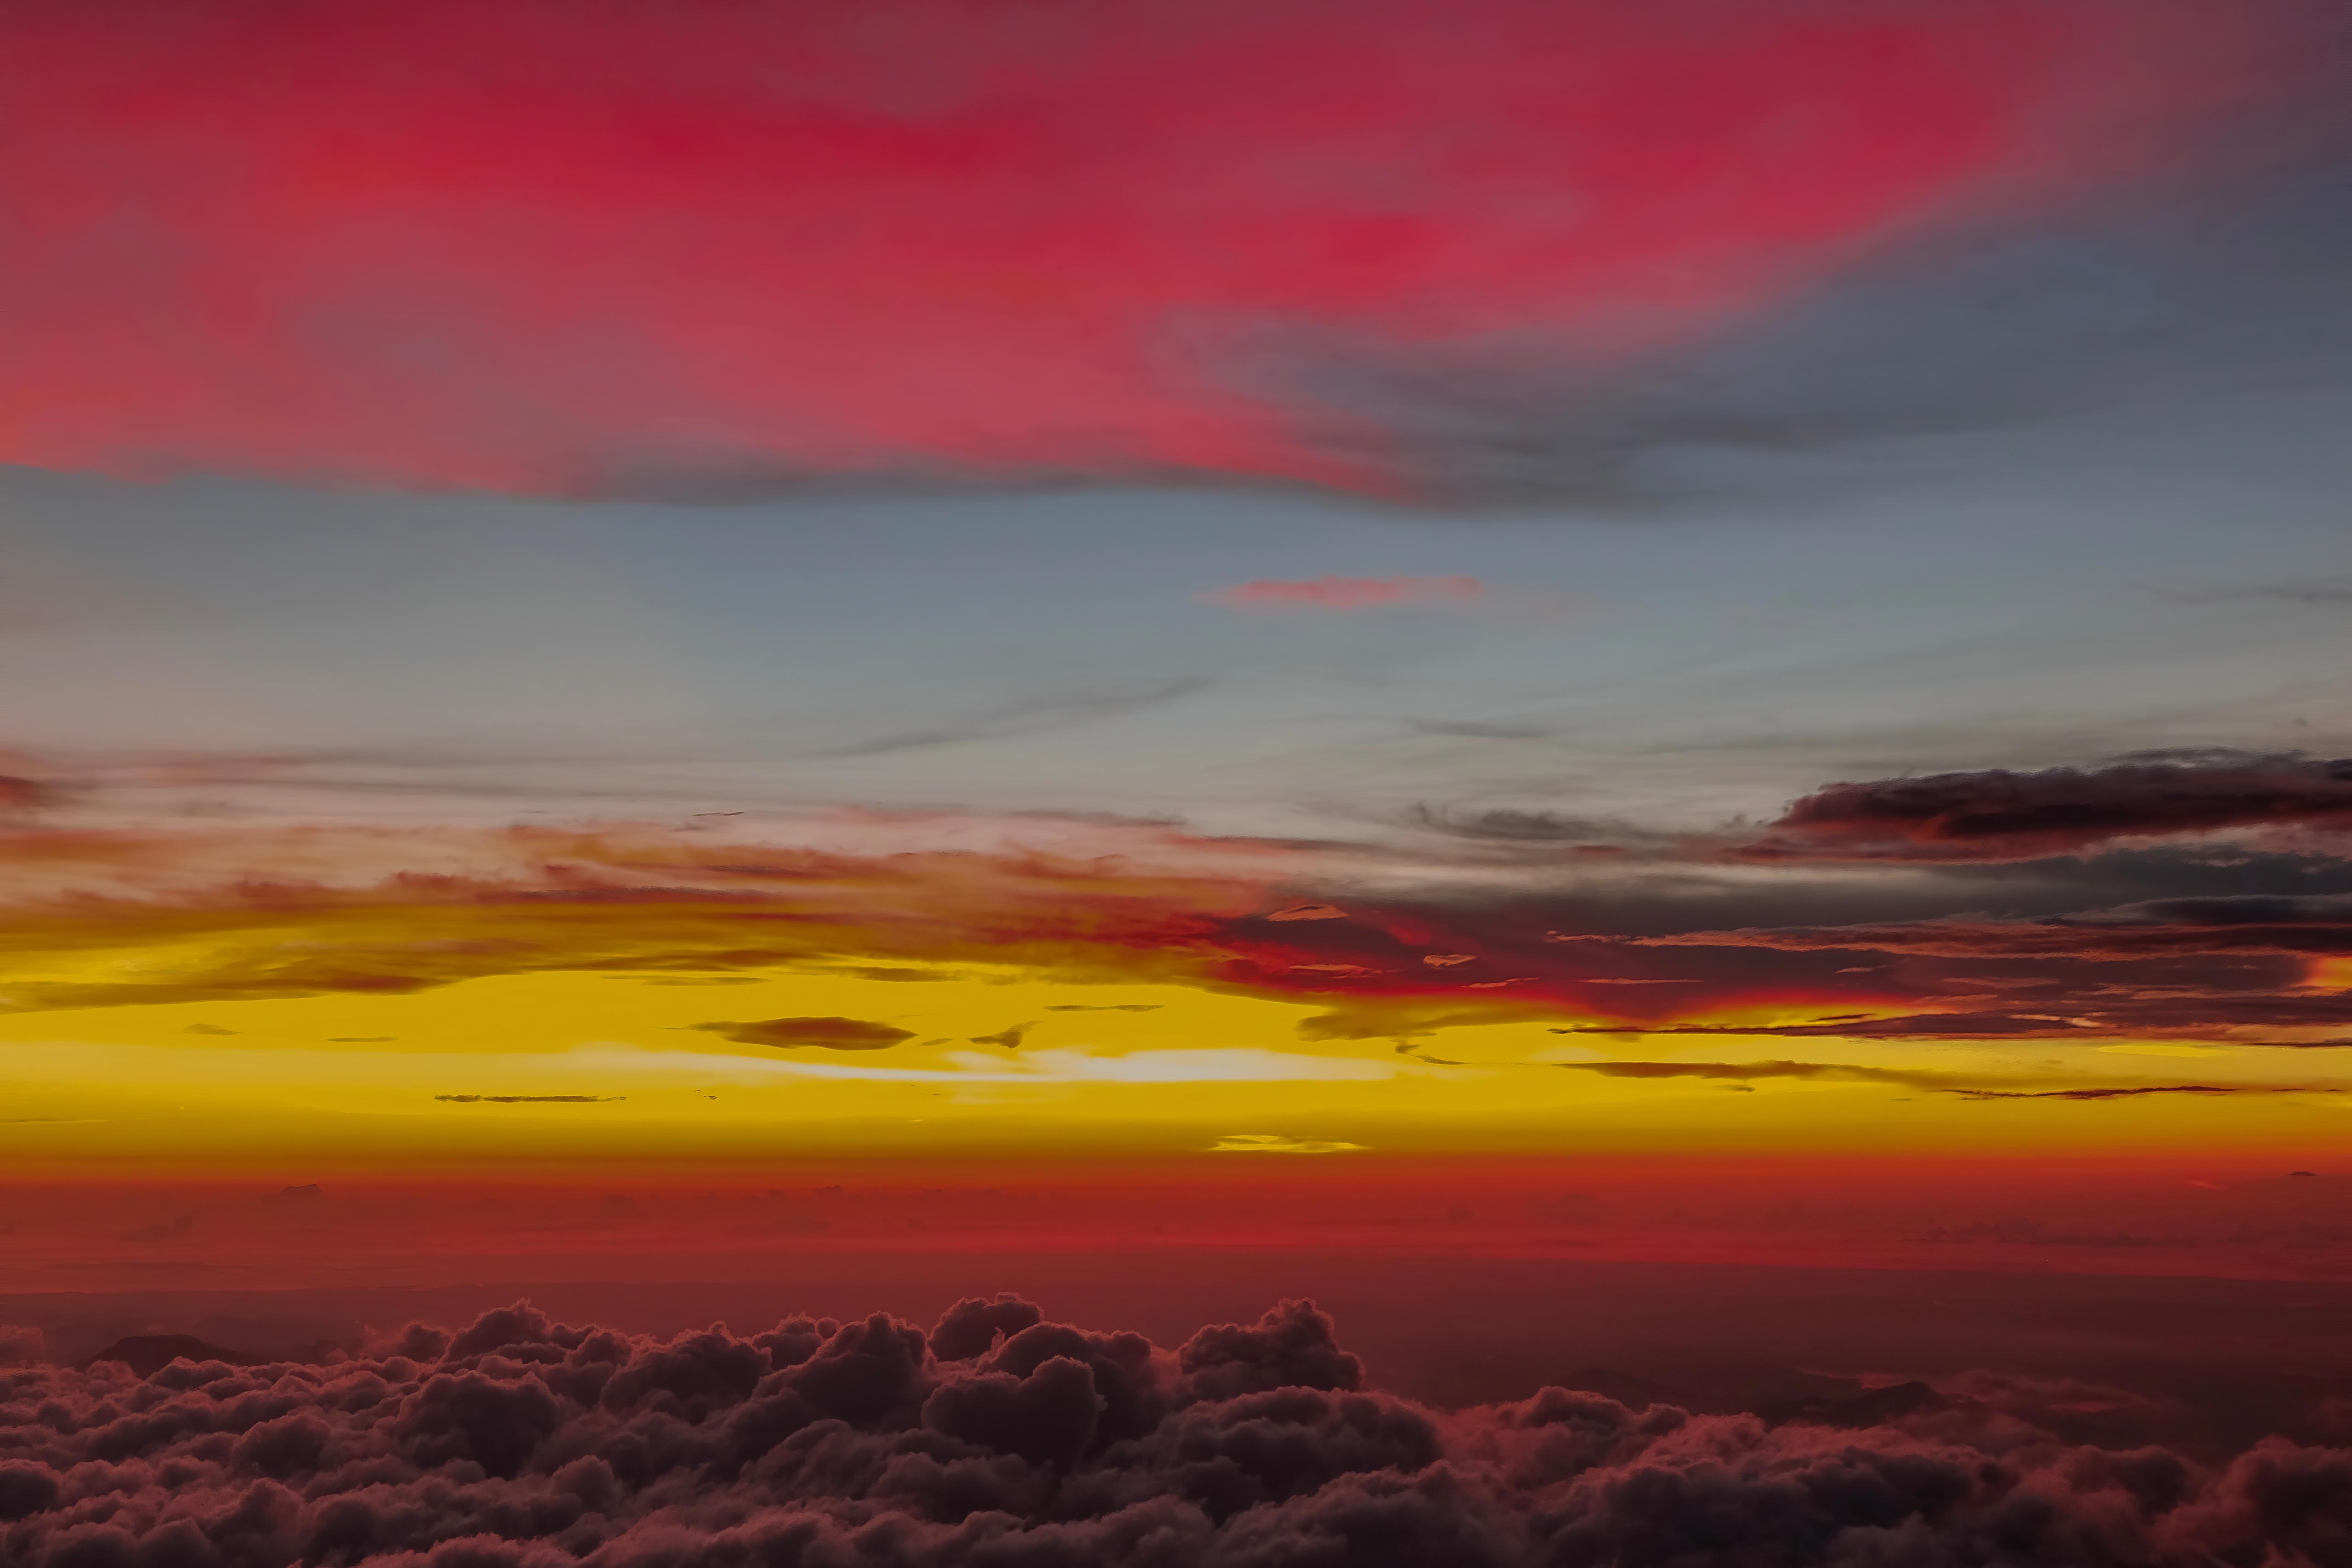 clouds silent nature 1574937486 - Clouds Silent Nature -